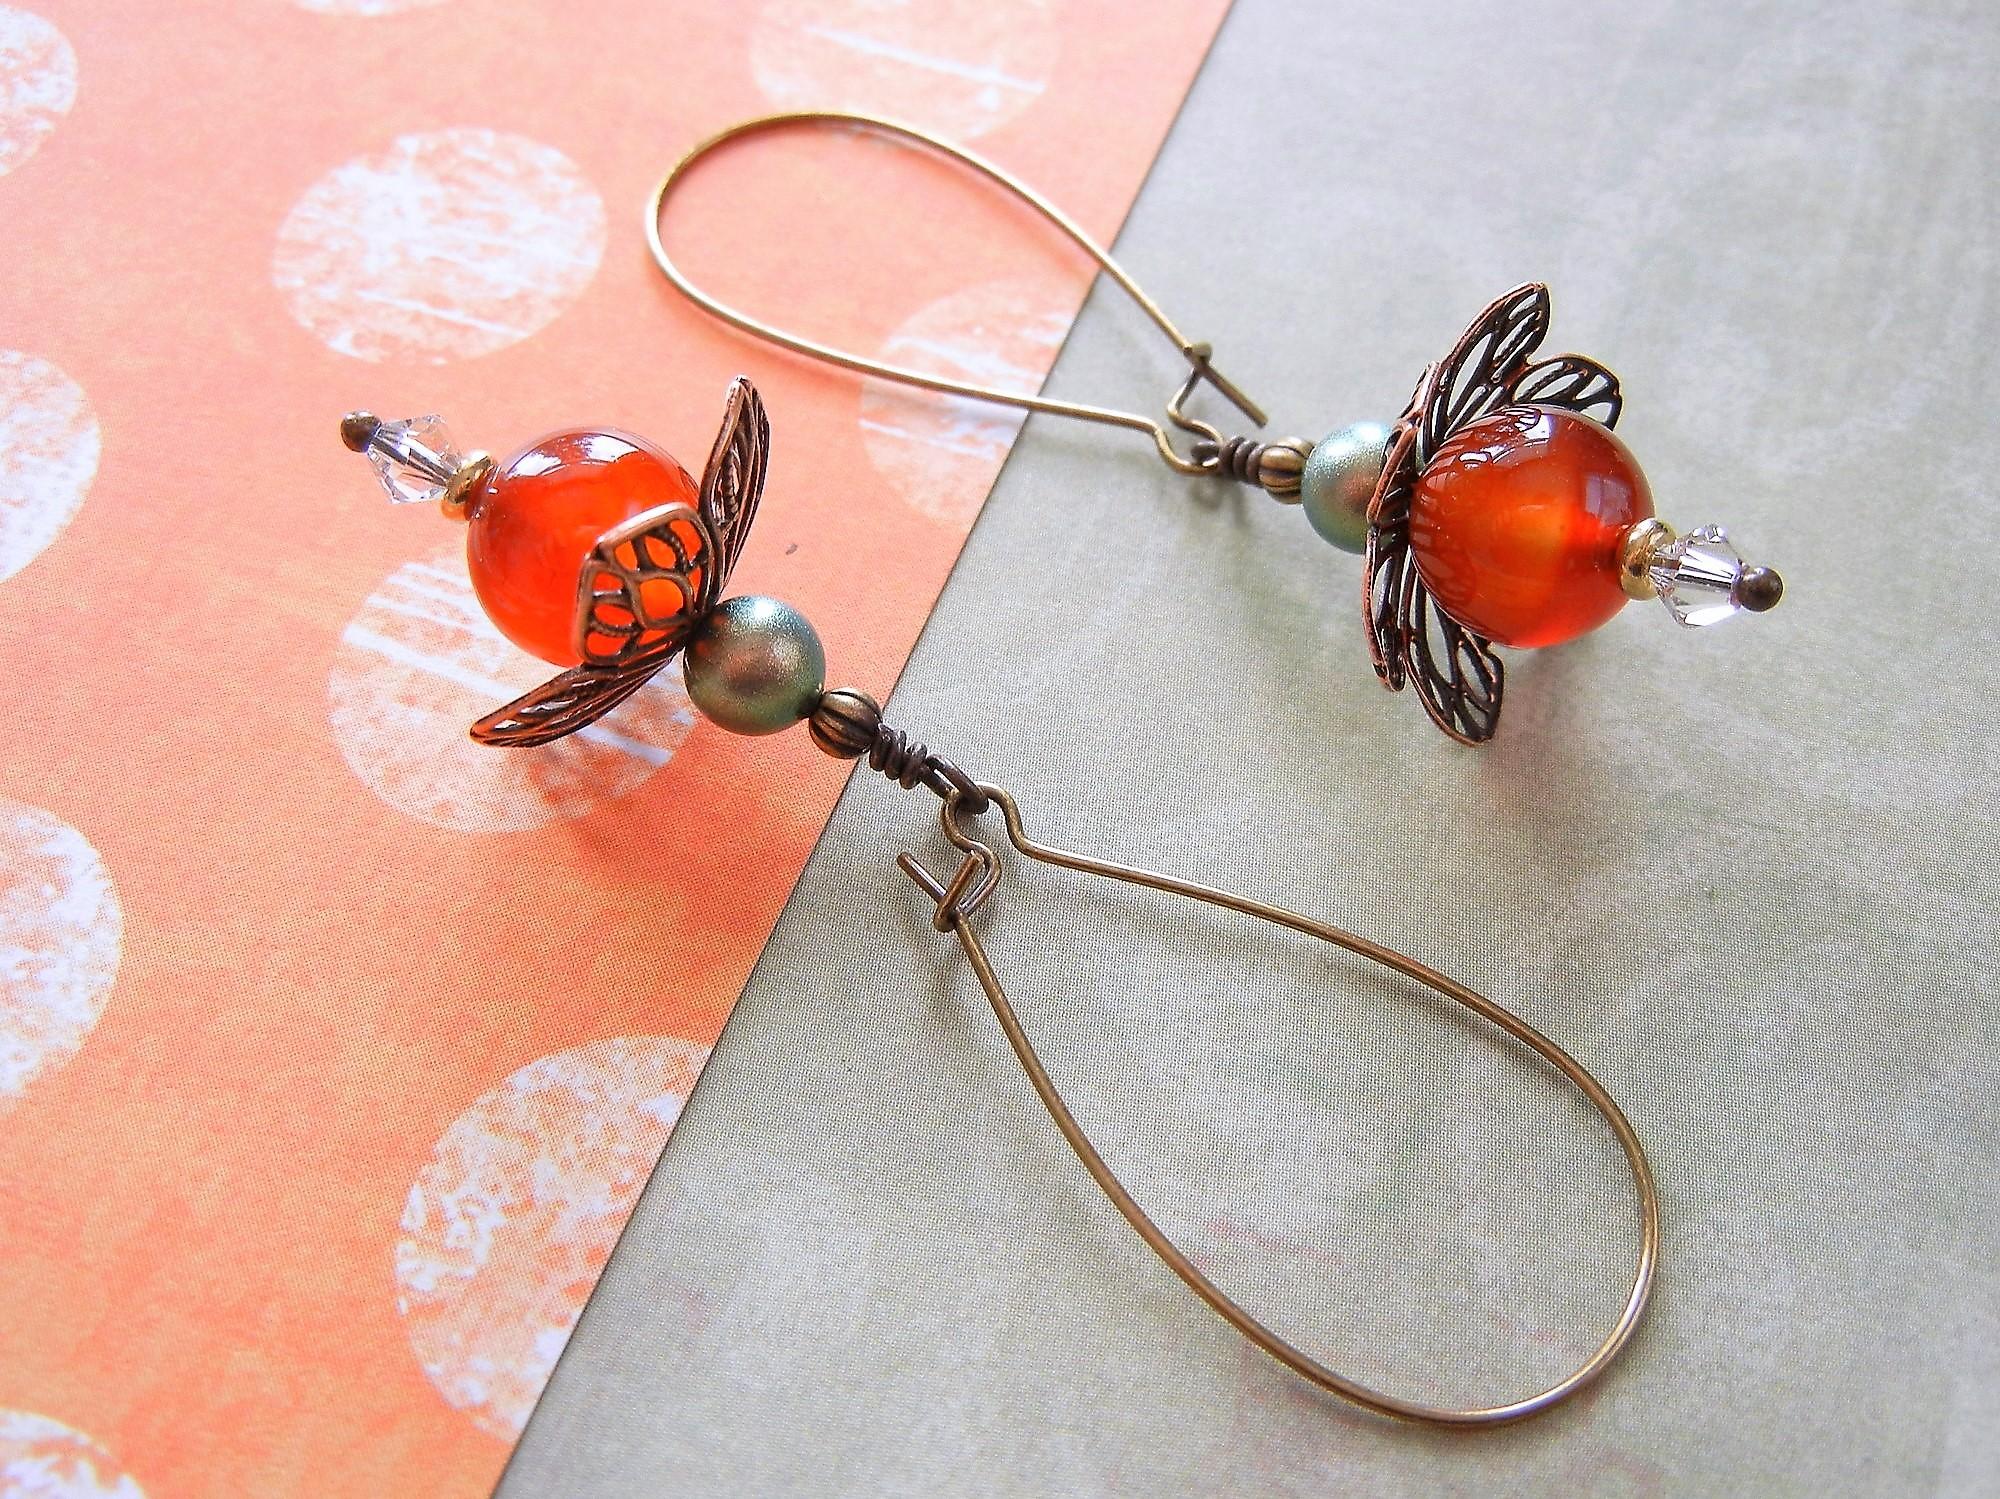 Bead Caps copper jewelry findings Copper Bead Caps copper jewelry components copper flower bead caps Flower shaped bead caps